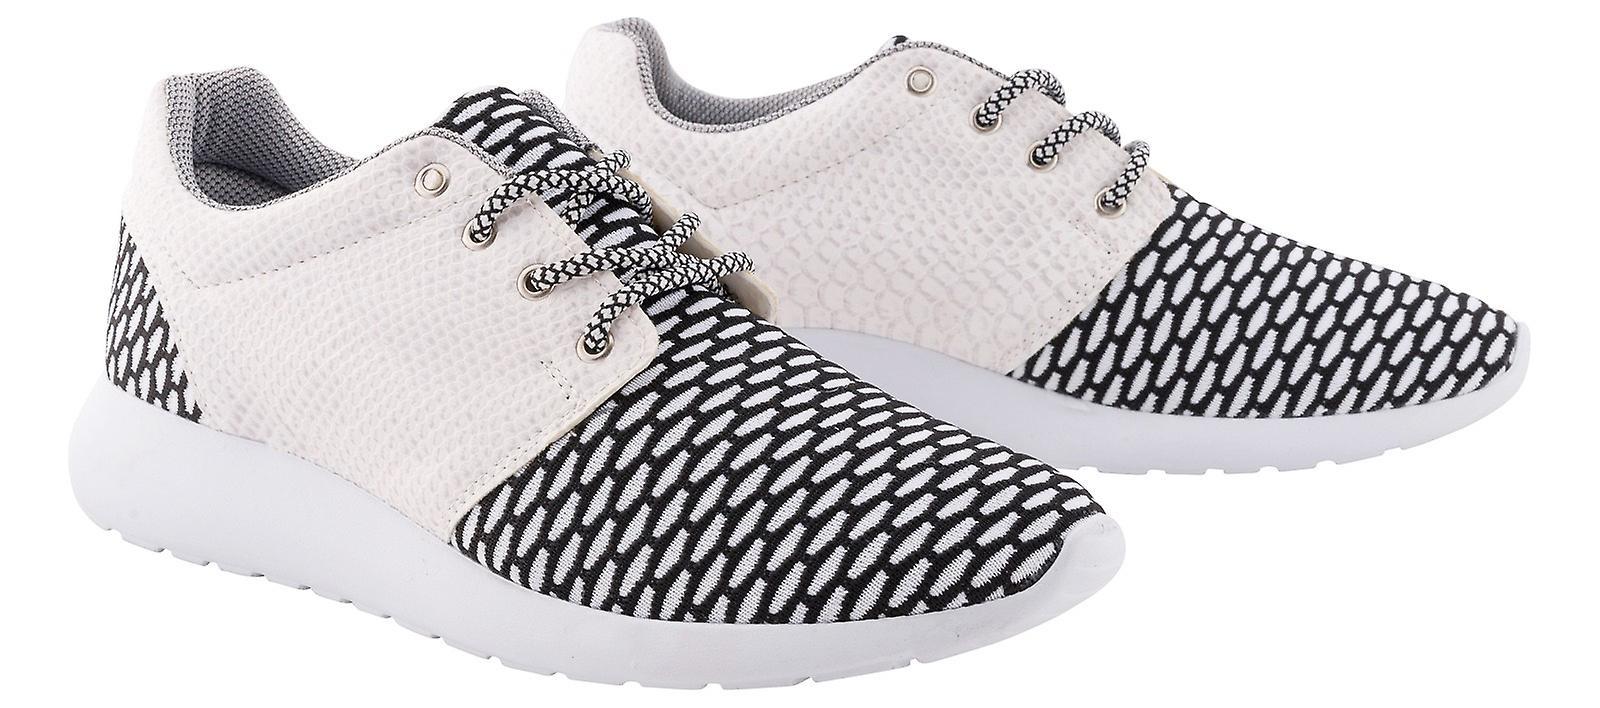 Tamboga Mens Trainers Snakeskin-look Sneakers Flat Oxfords